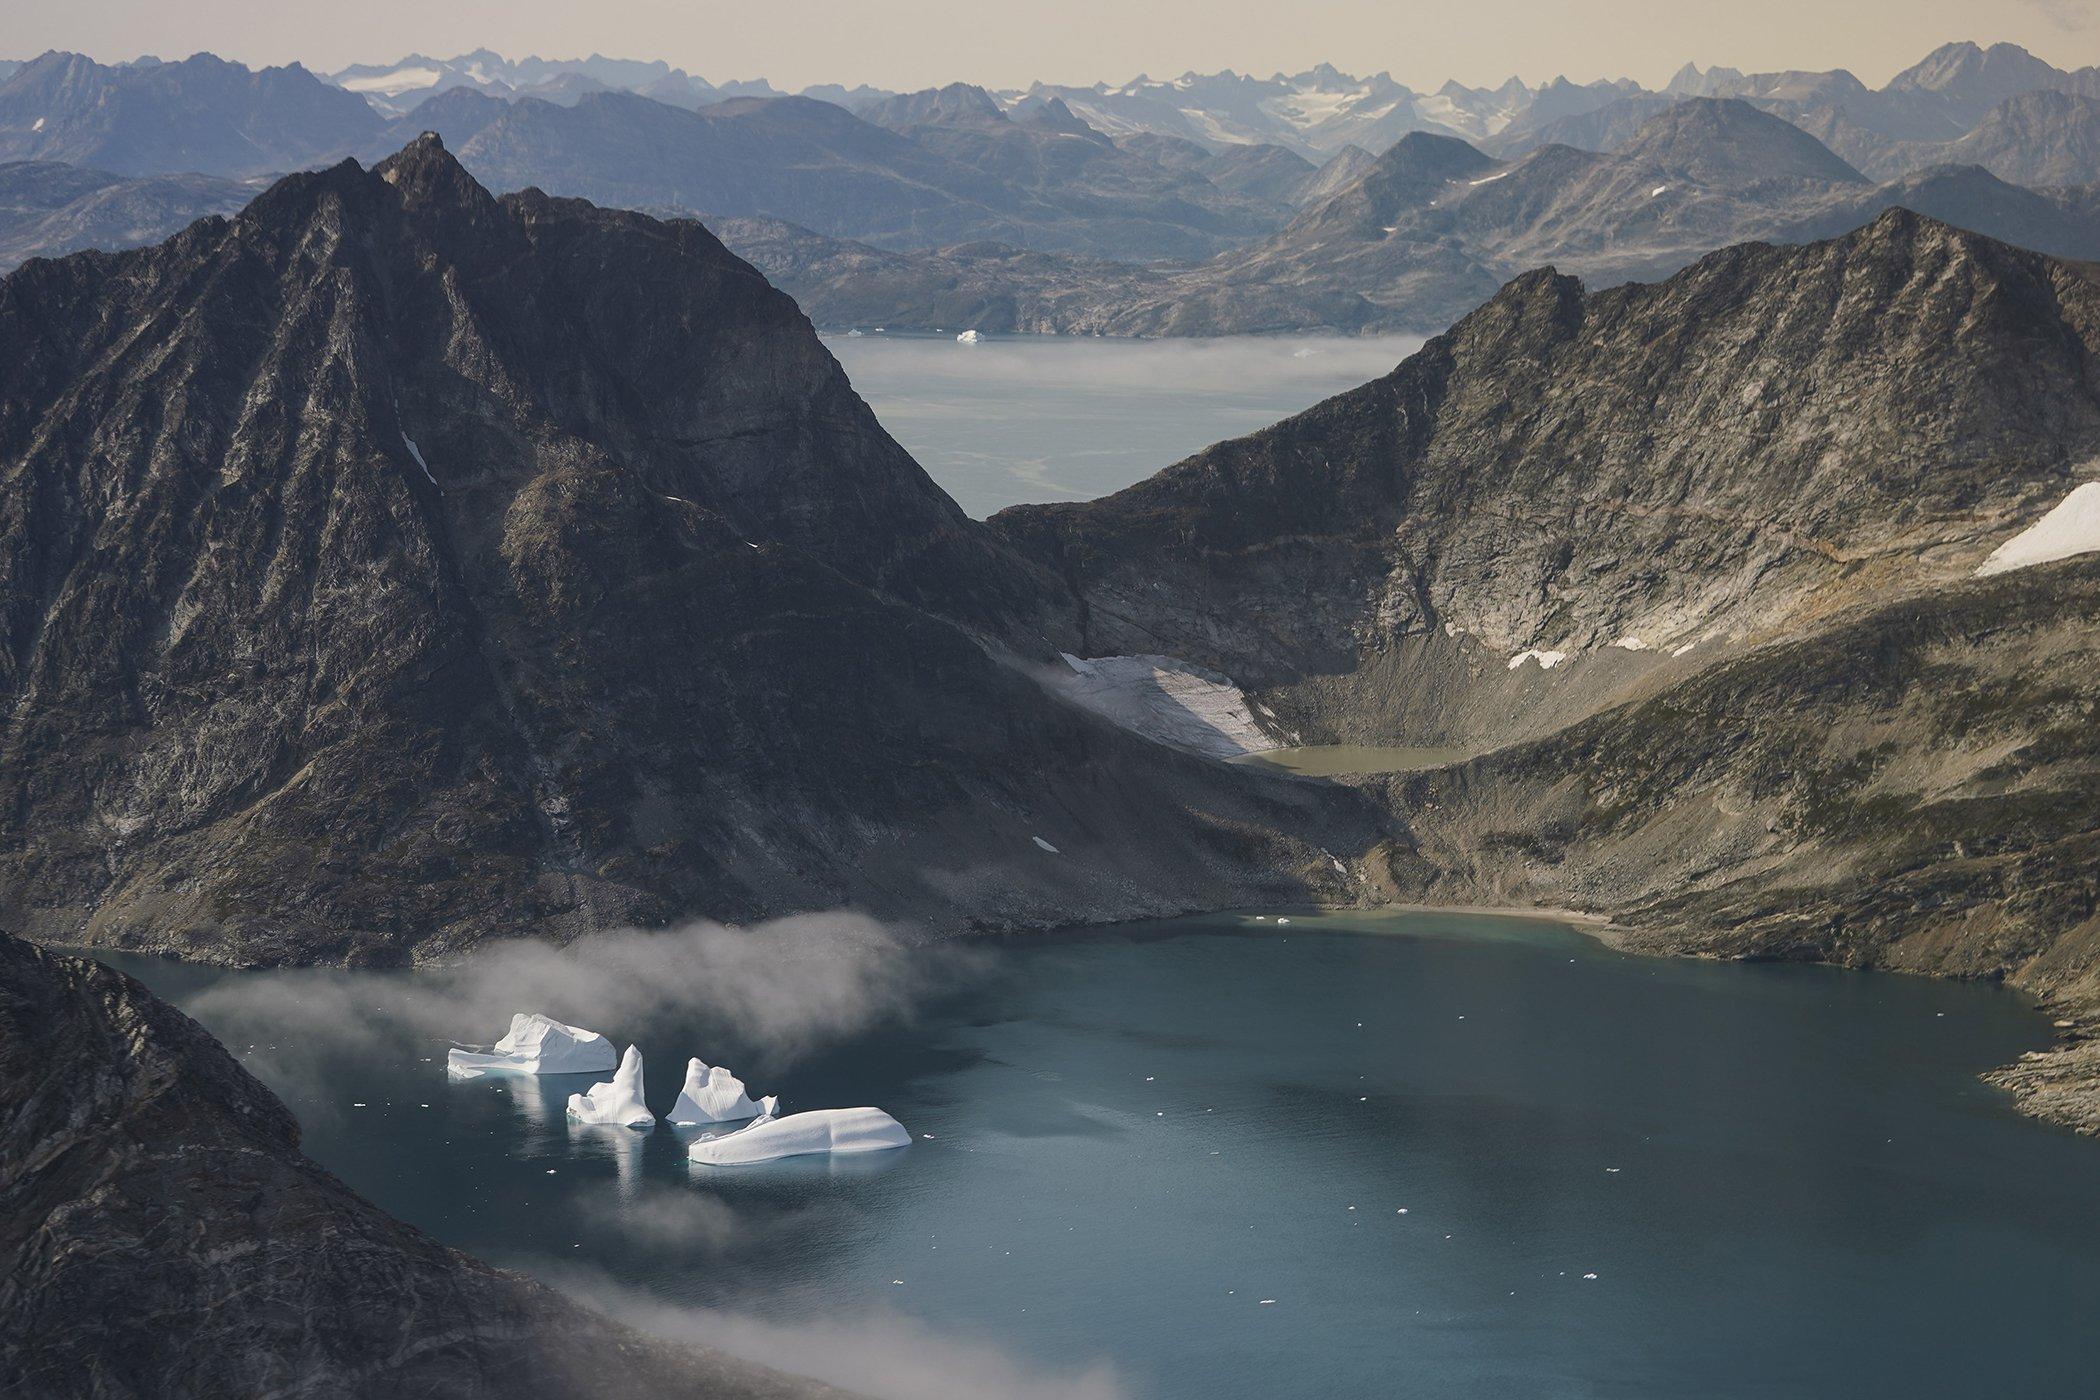 Greenland-Icebergs-Melting-Climate-Change.jpg